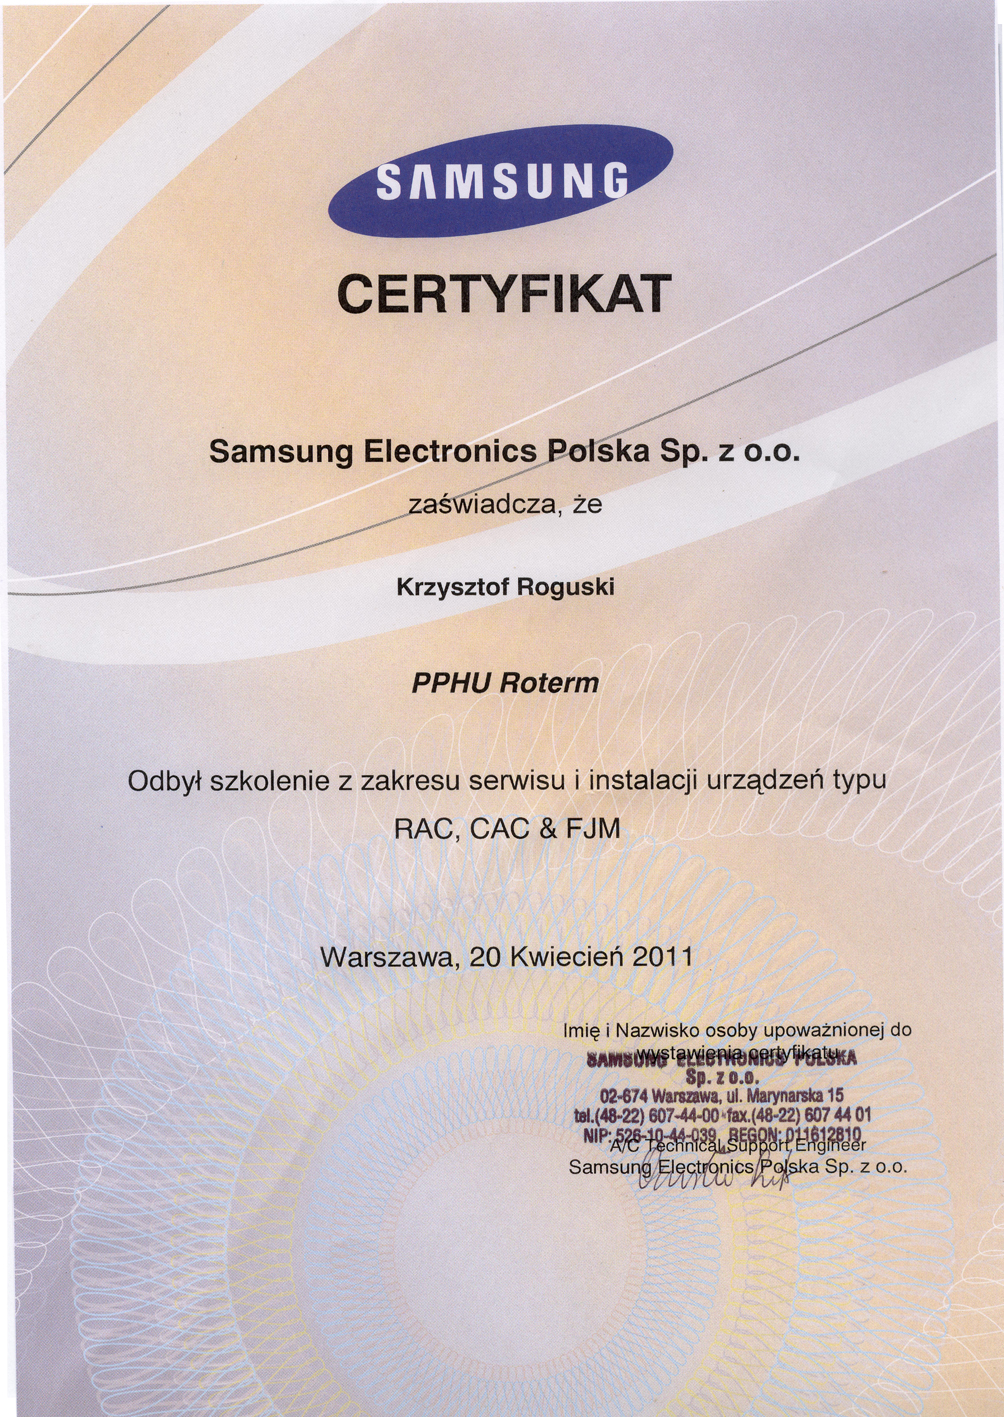 certyfikat_samsung_male.jpg